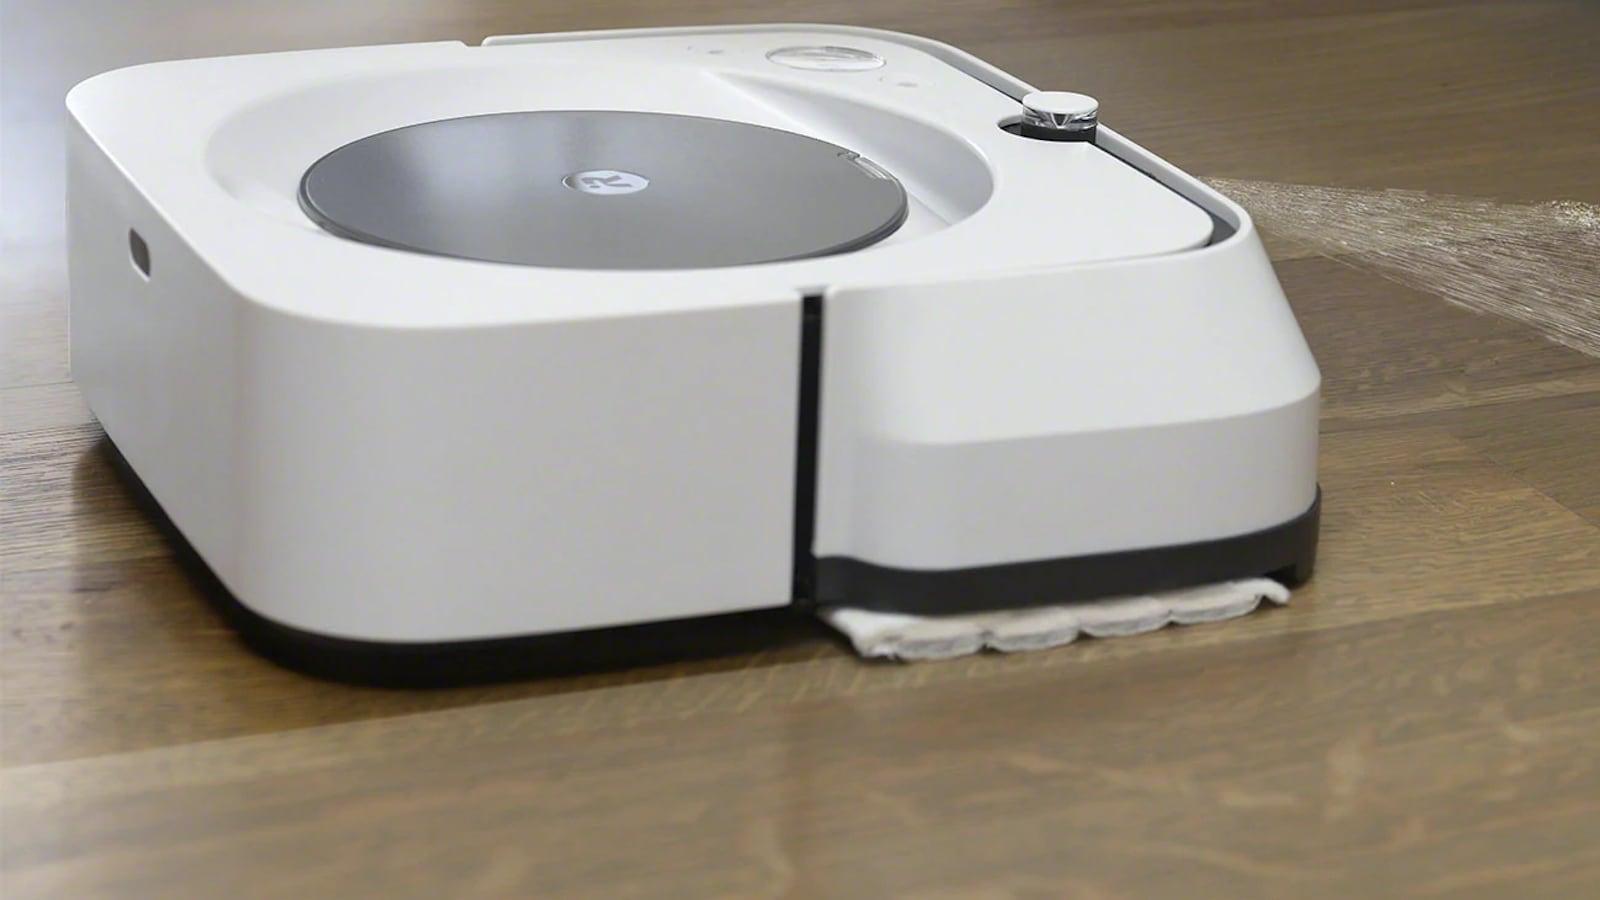 iRobot Roomba s9 PLUS automatic vacuum